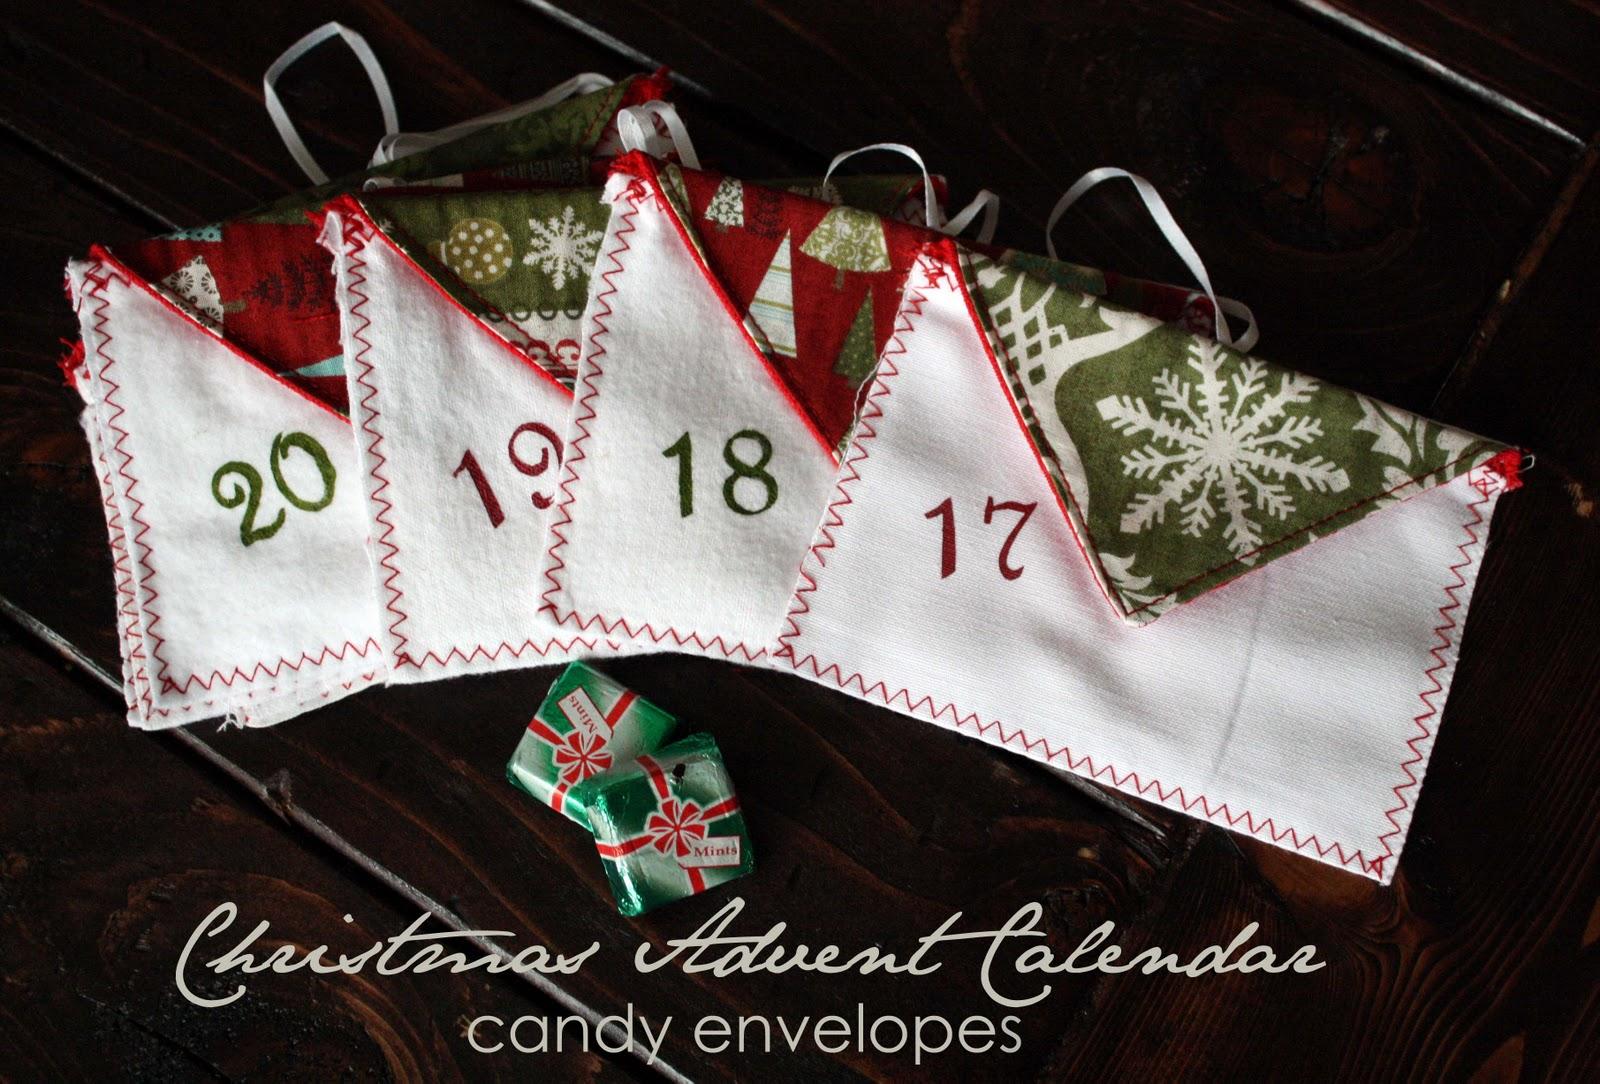 Advent Calendar Envelopes Ideas : Running with scissors advent calendar envelopes